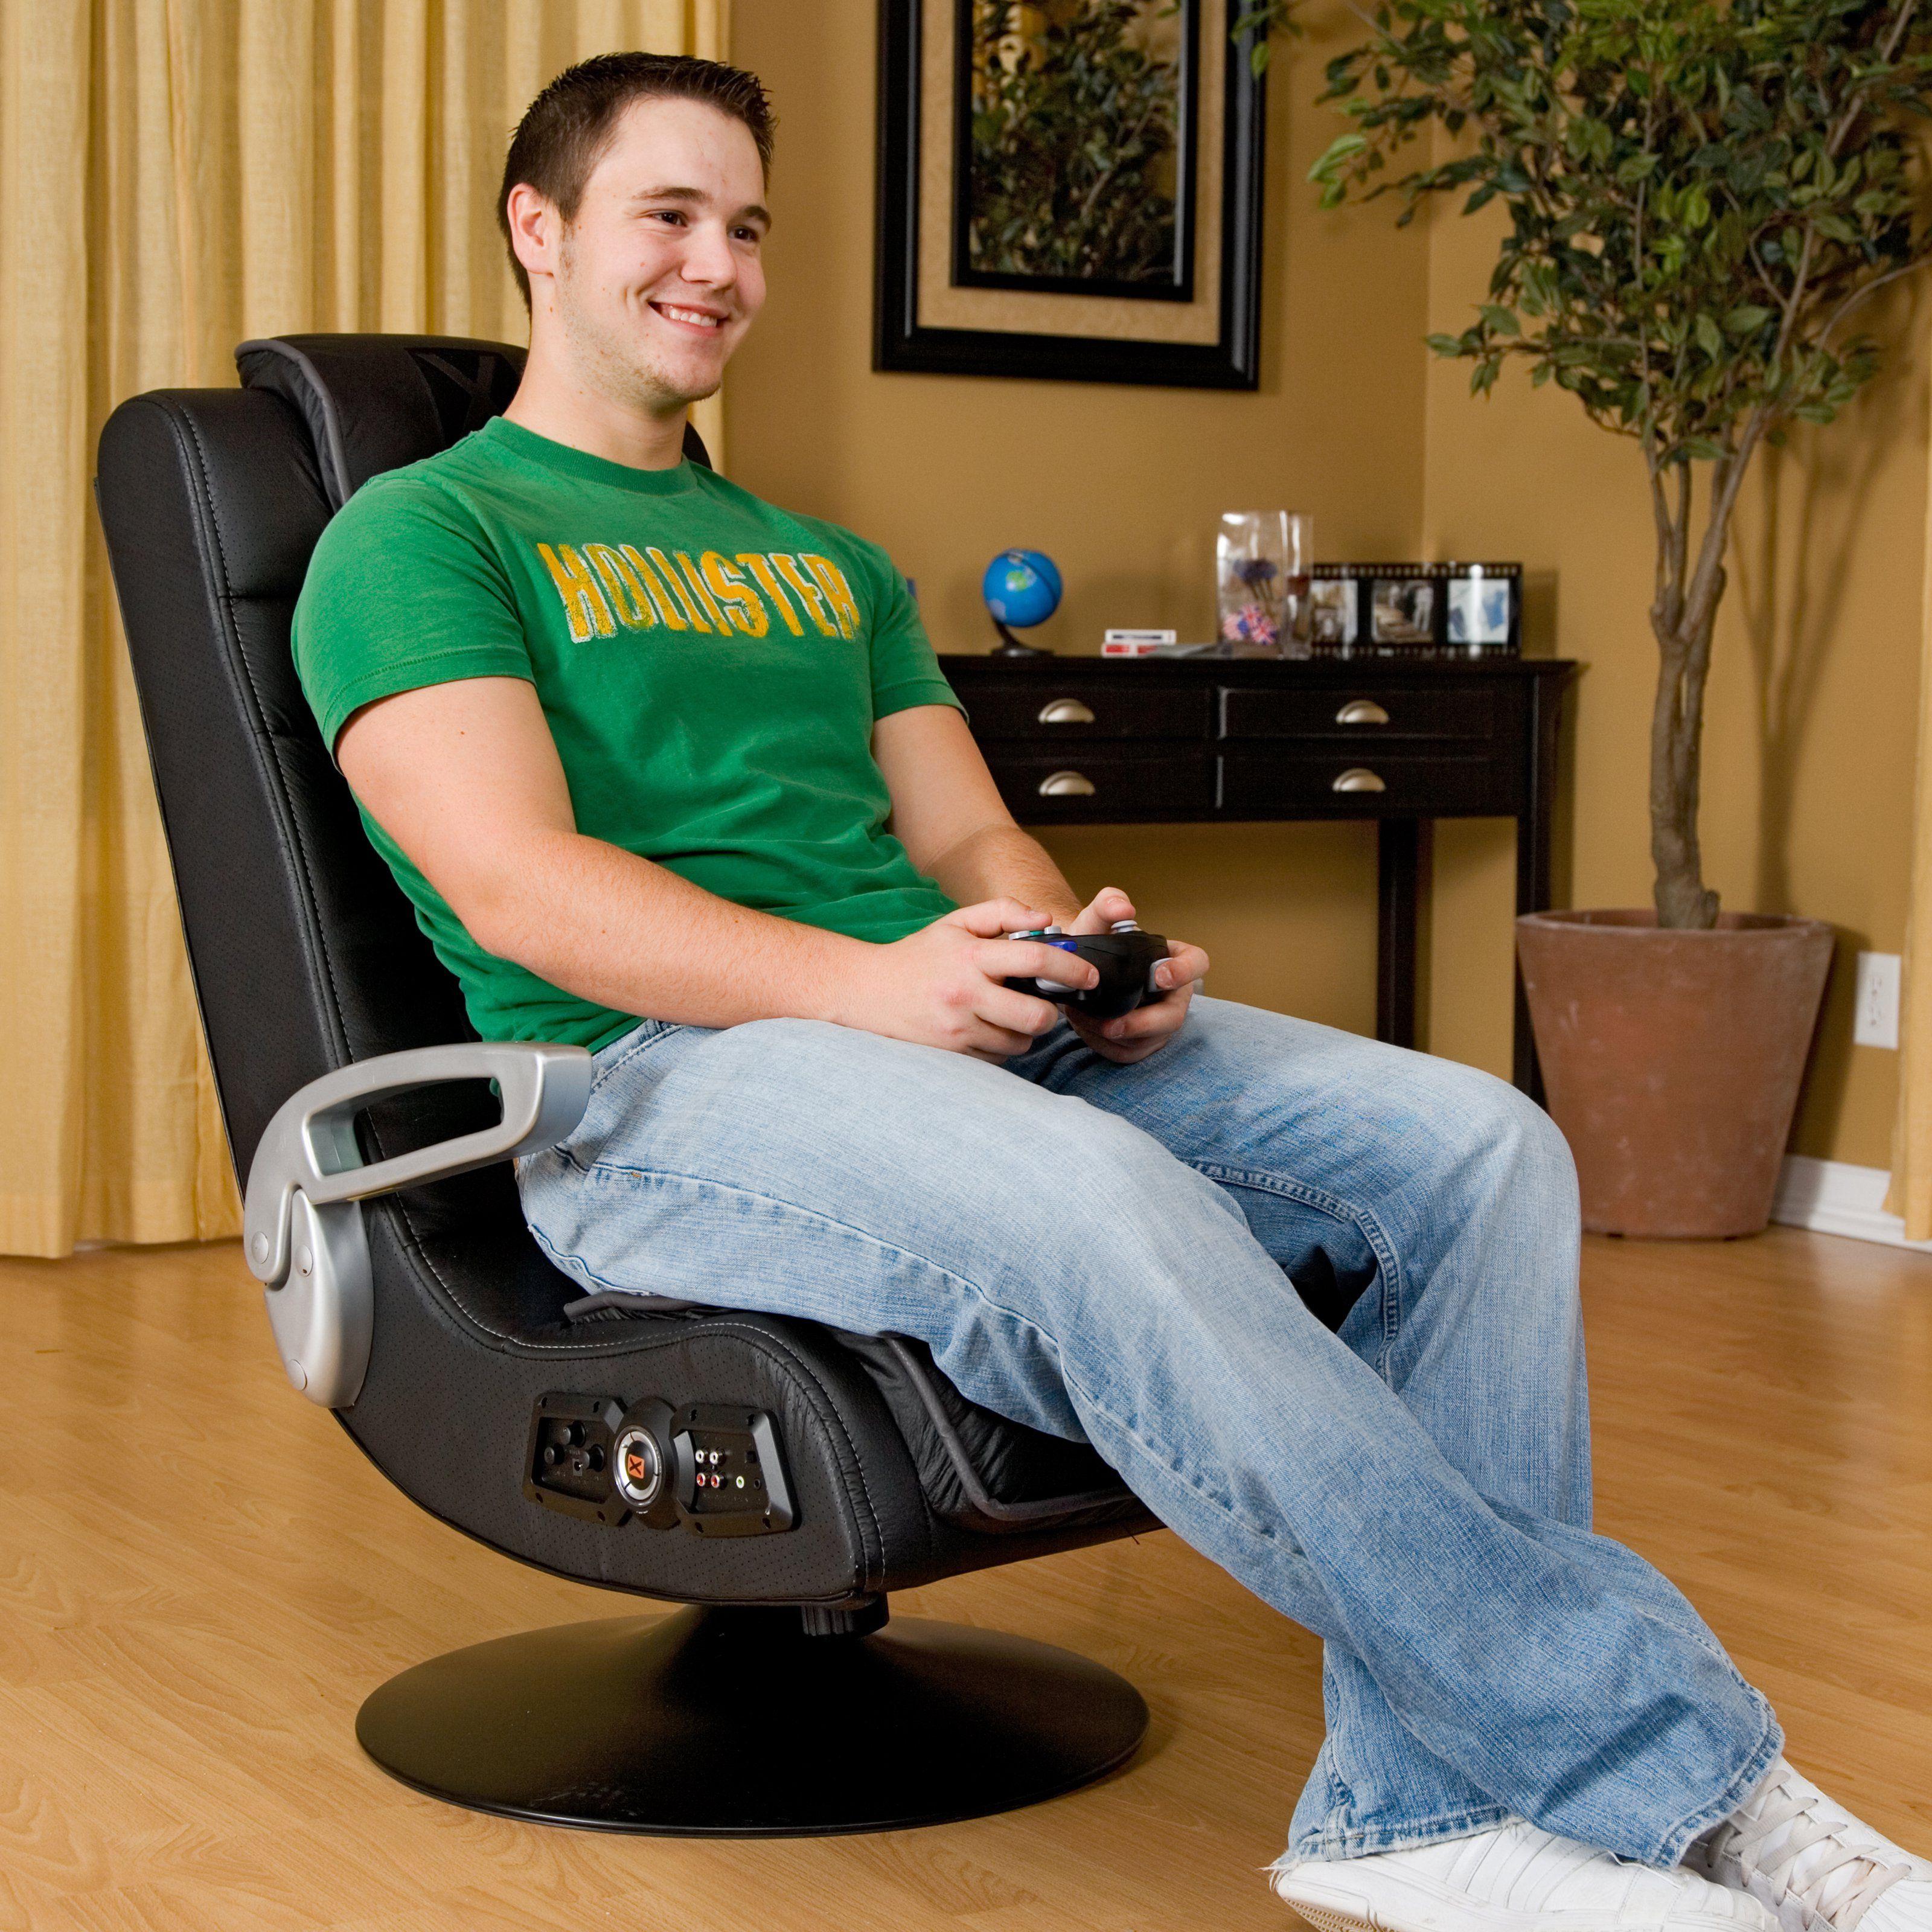 gaming furniture photos x inspirations wireless chair pedestal imposing video black home rocker